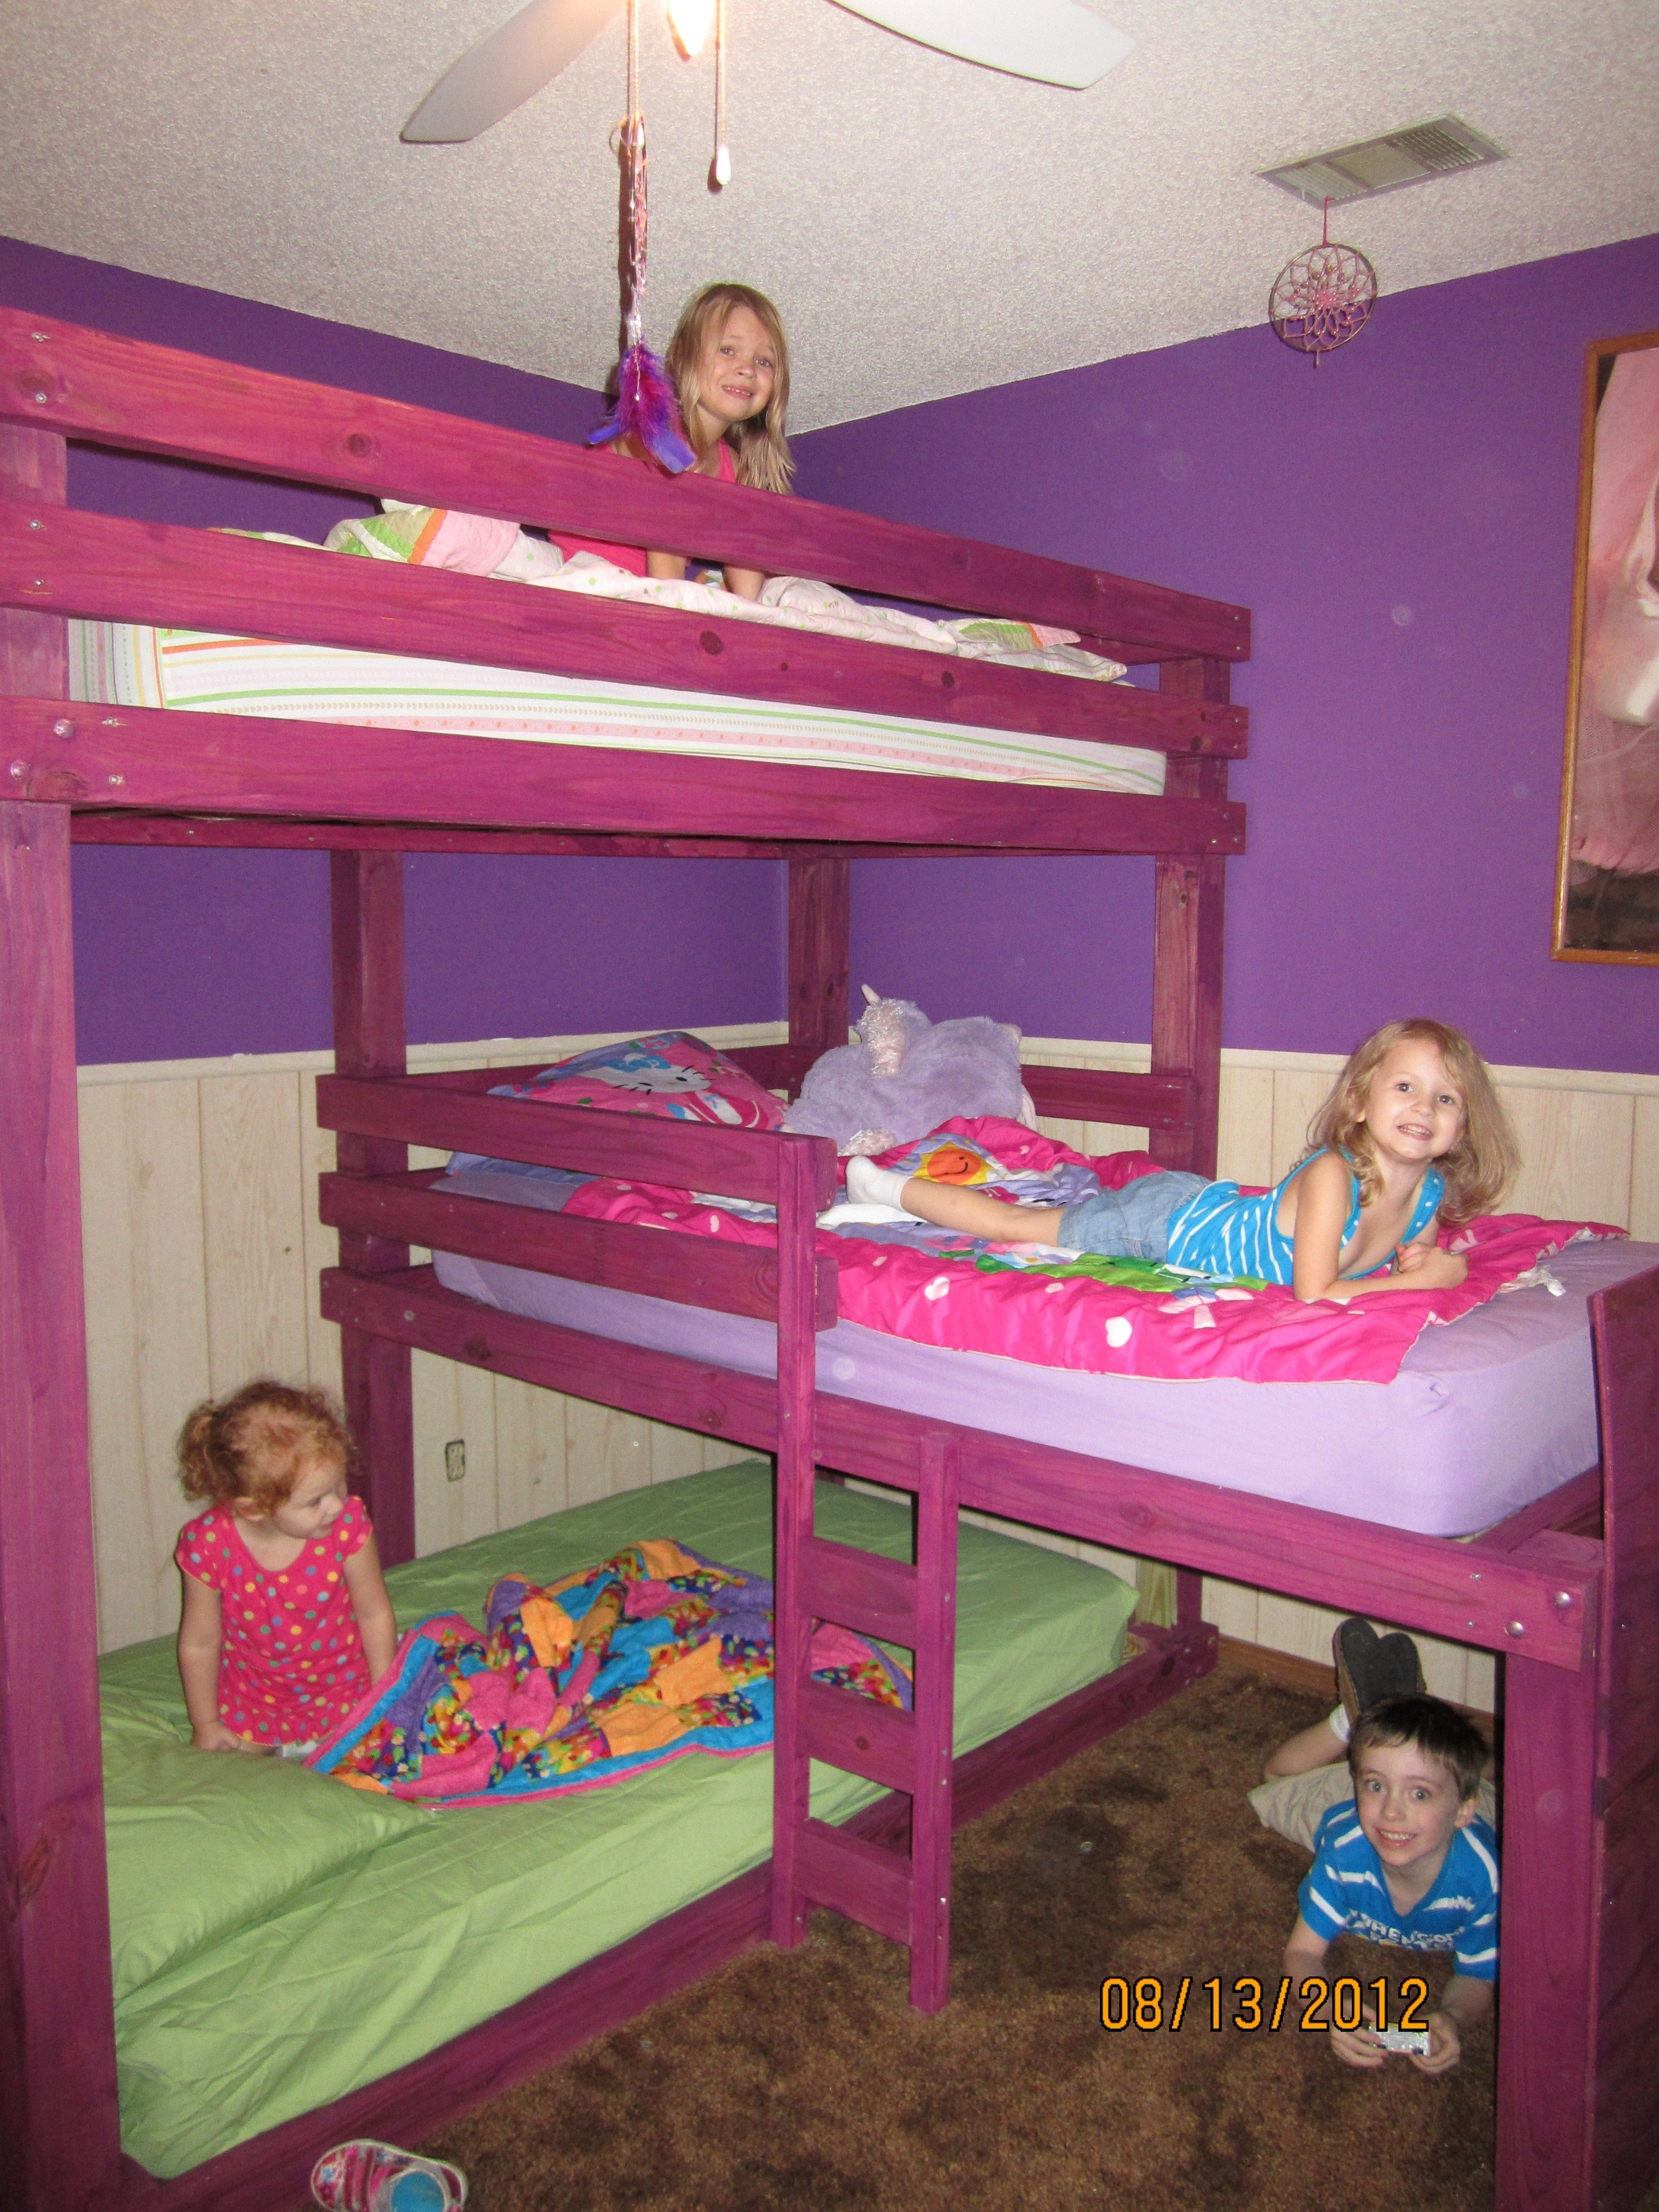 Triple bunk beds we built this weekend!